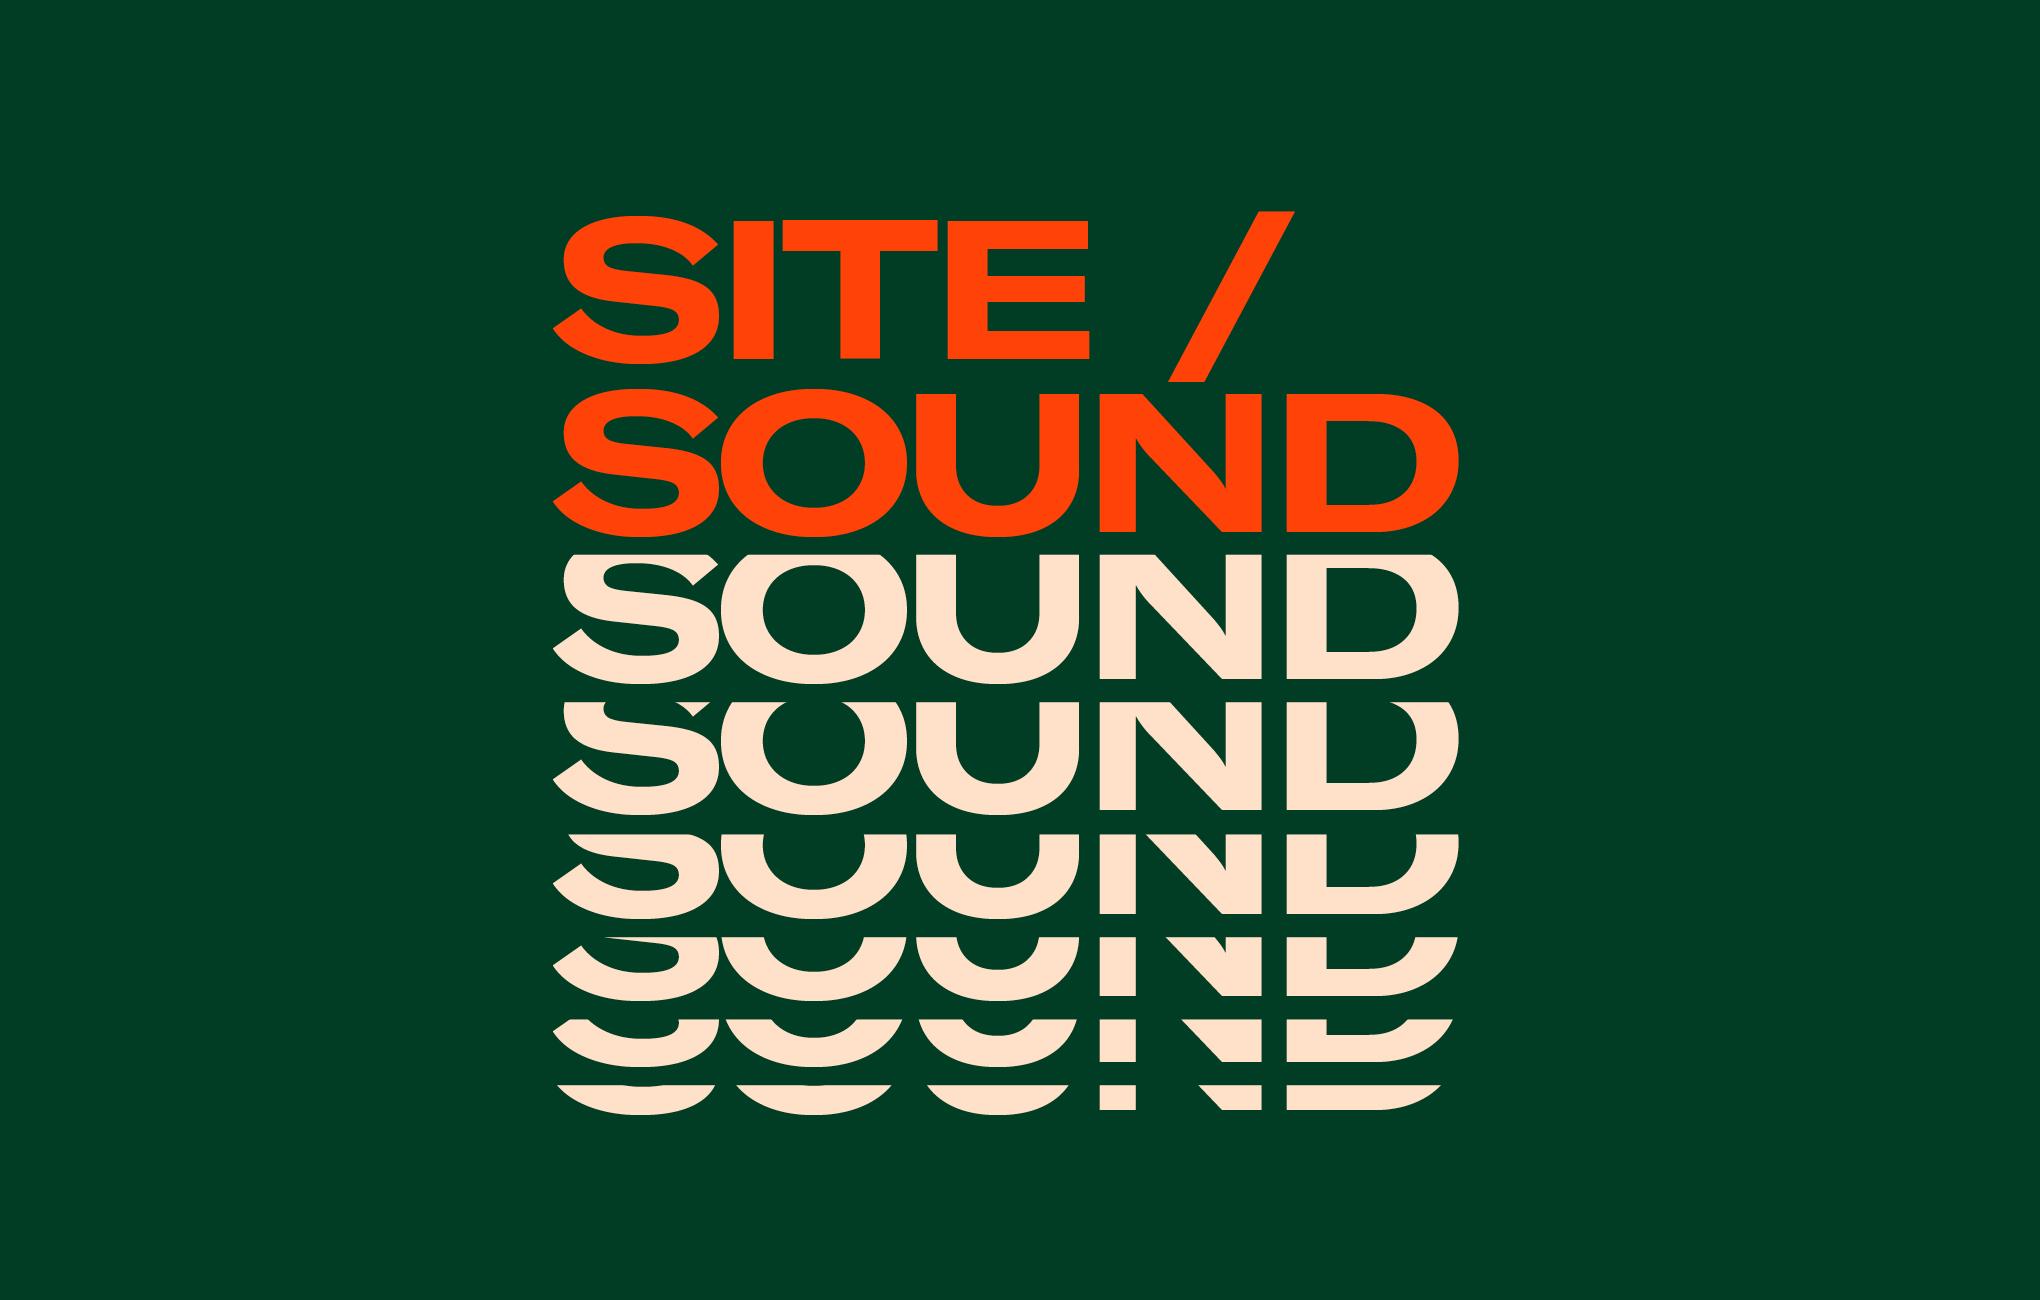 Site/Sound